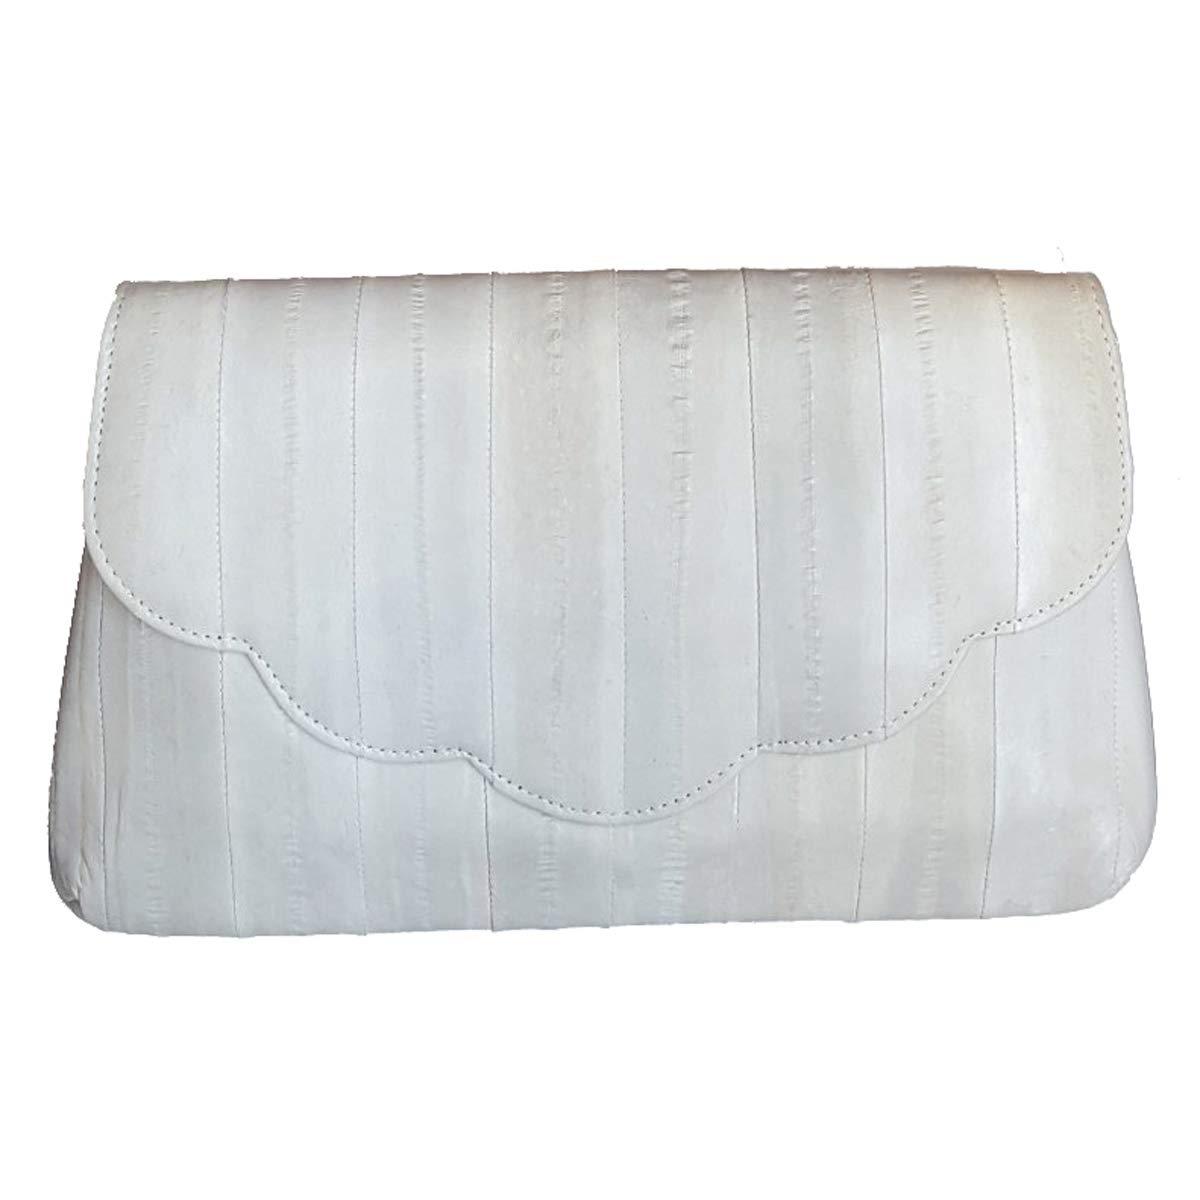 Sunflower clutch bag, chain clutch bag, natural genuine eelskin wallet